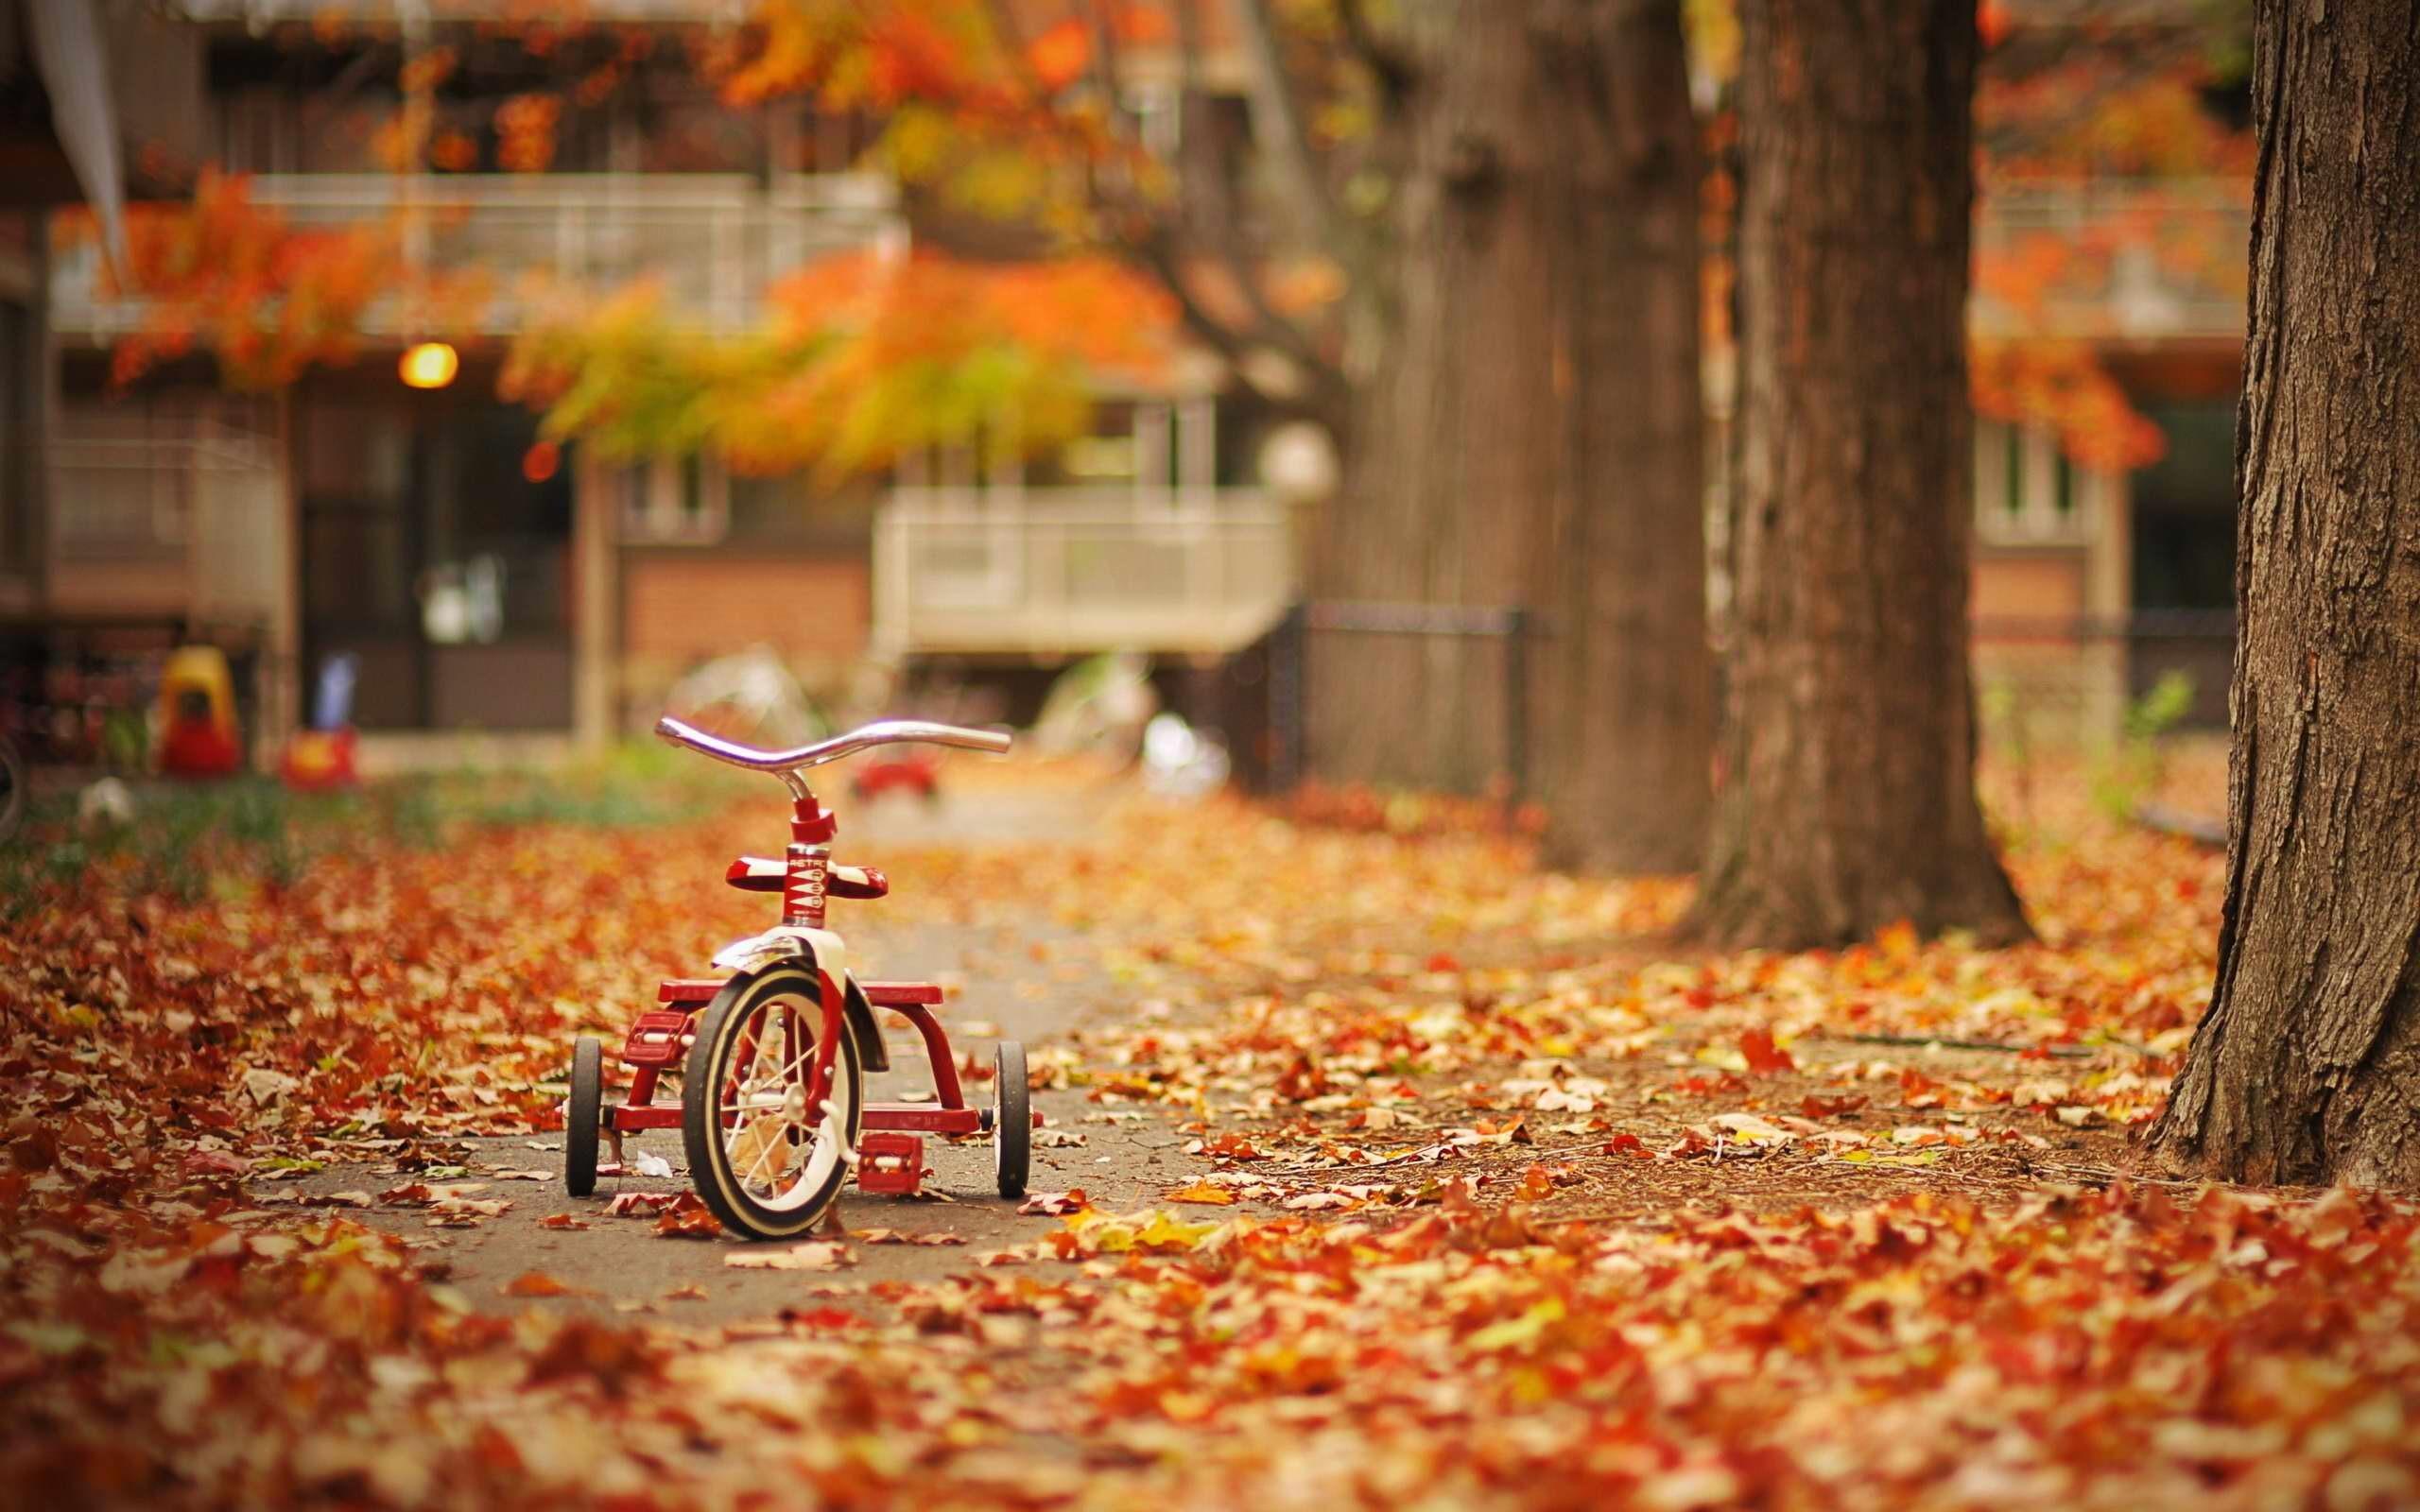 Fall Season, wallpaper, Fall Season hd wallpaper, background desktop